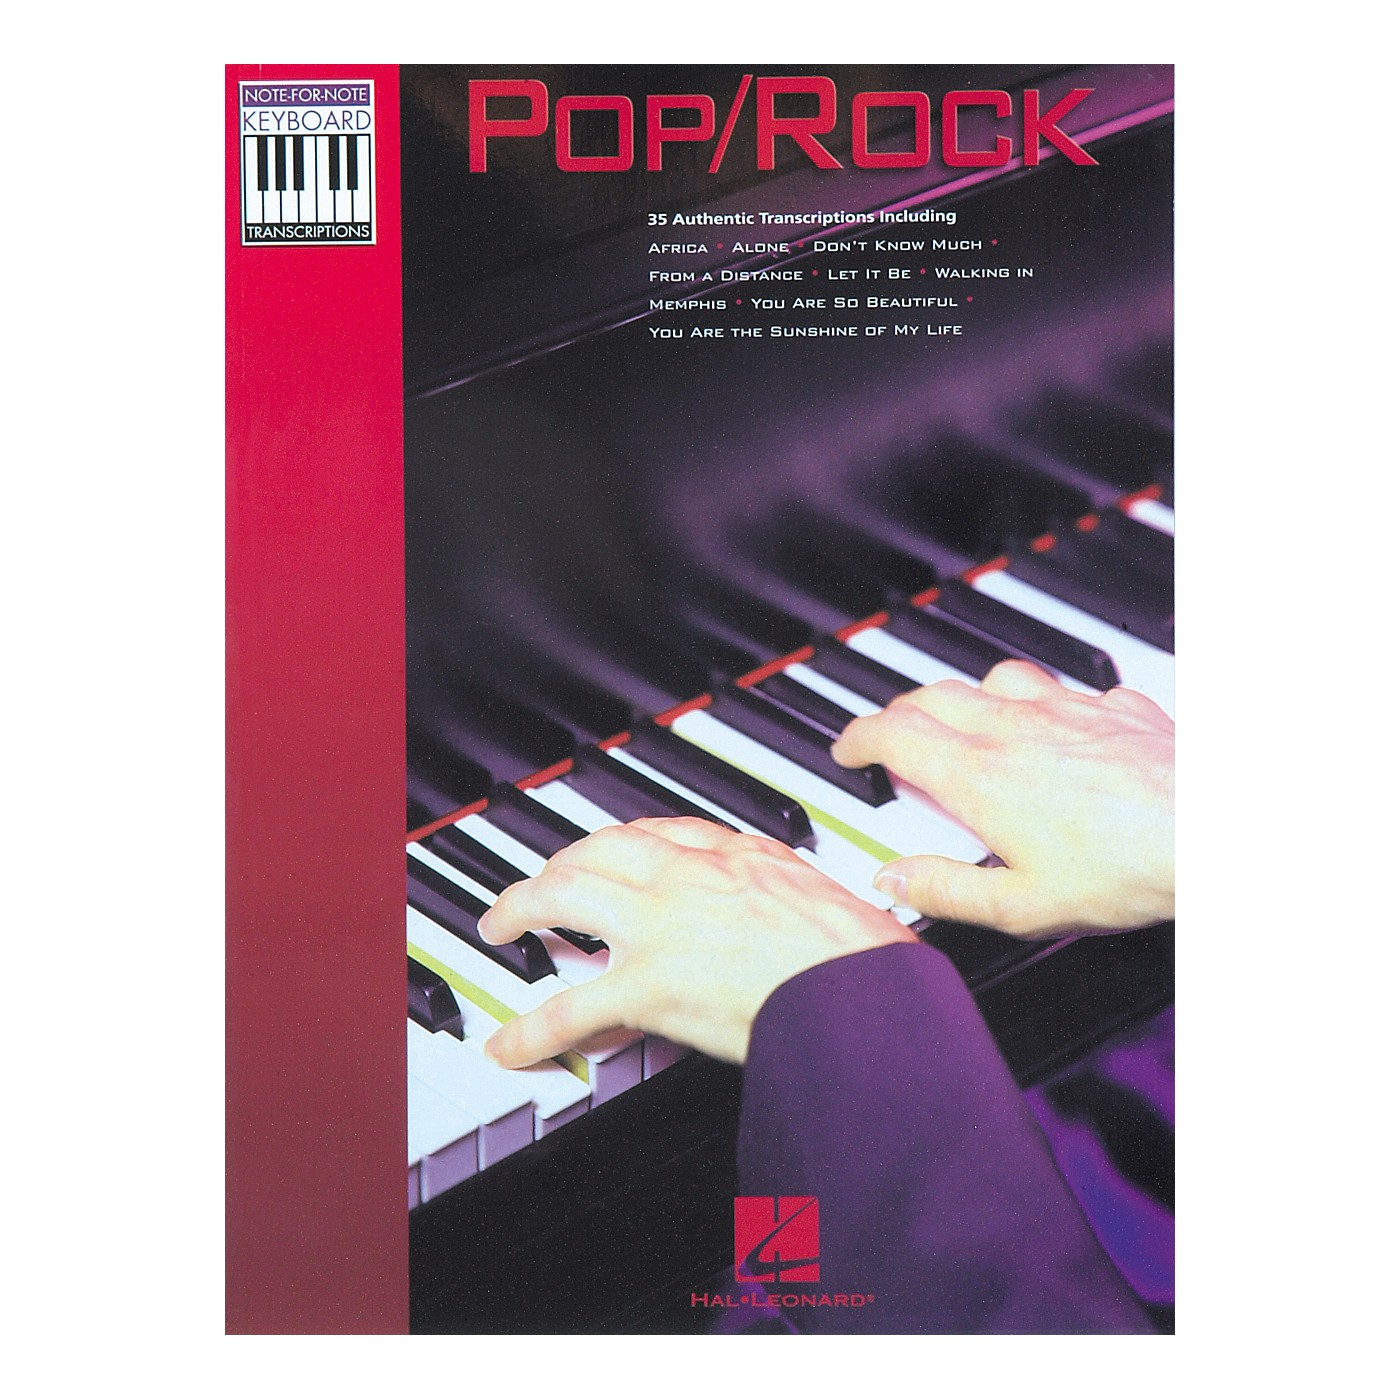 Hal Leonard Pop Rock Keyboard Transcriptions Songbook thumbnail